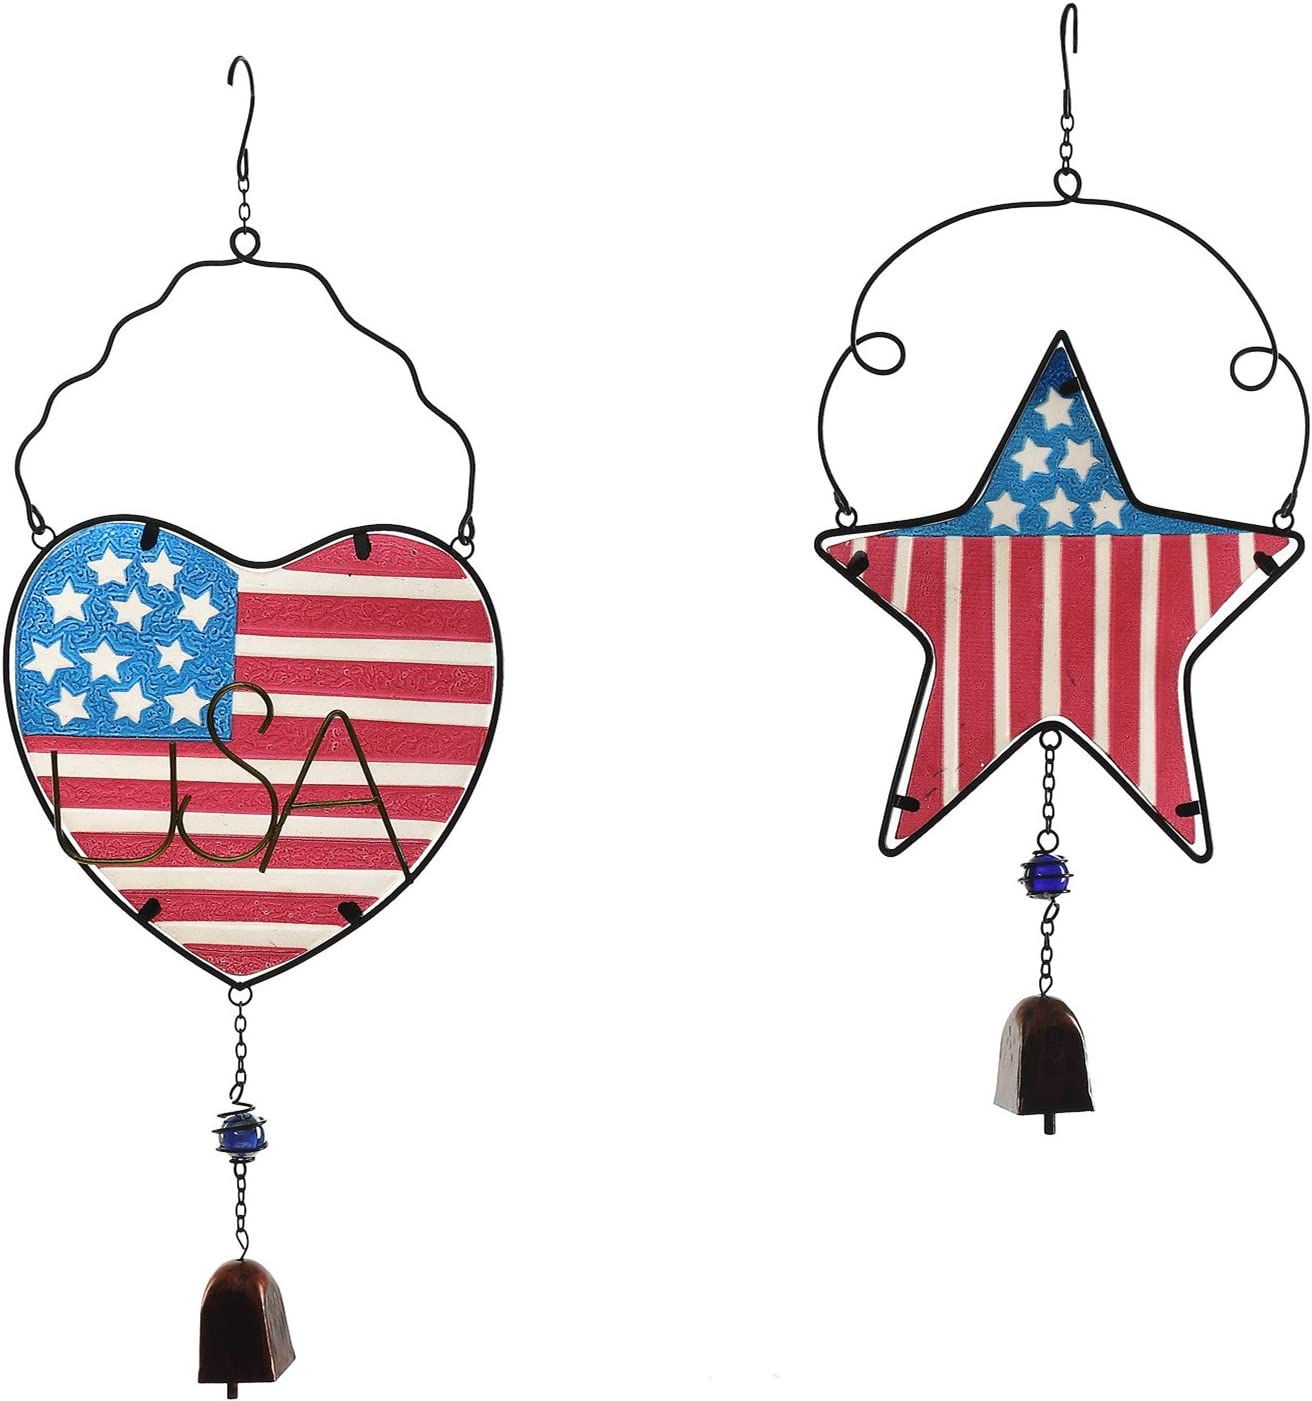 CEDAR HOME Wind Chime Unique Outdoor Indoor Hanging Mobile Bell Windchime for Garden Lawn Yard Patio Waterproof Metal Glass Patriotic American Flag Home Decor, 9.5